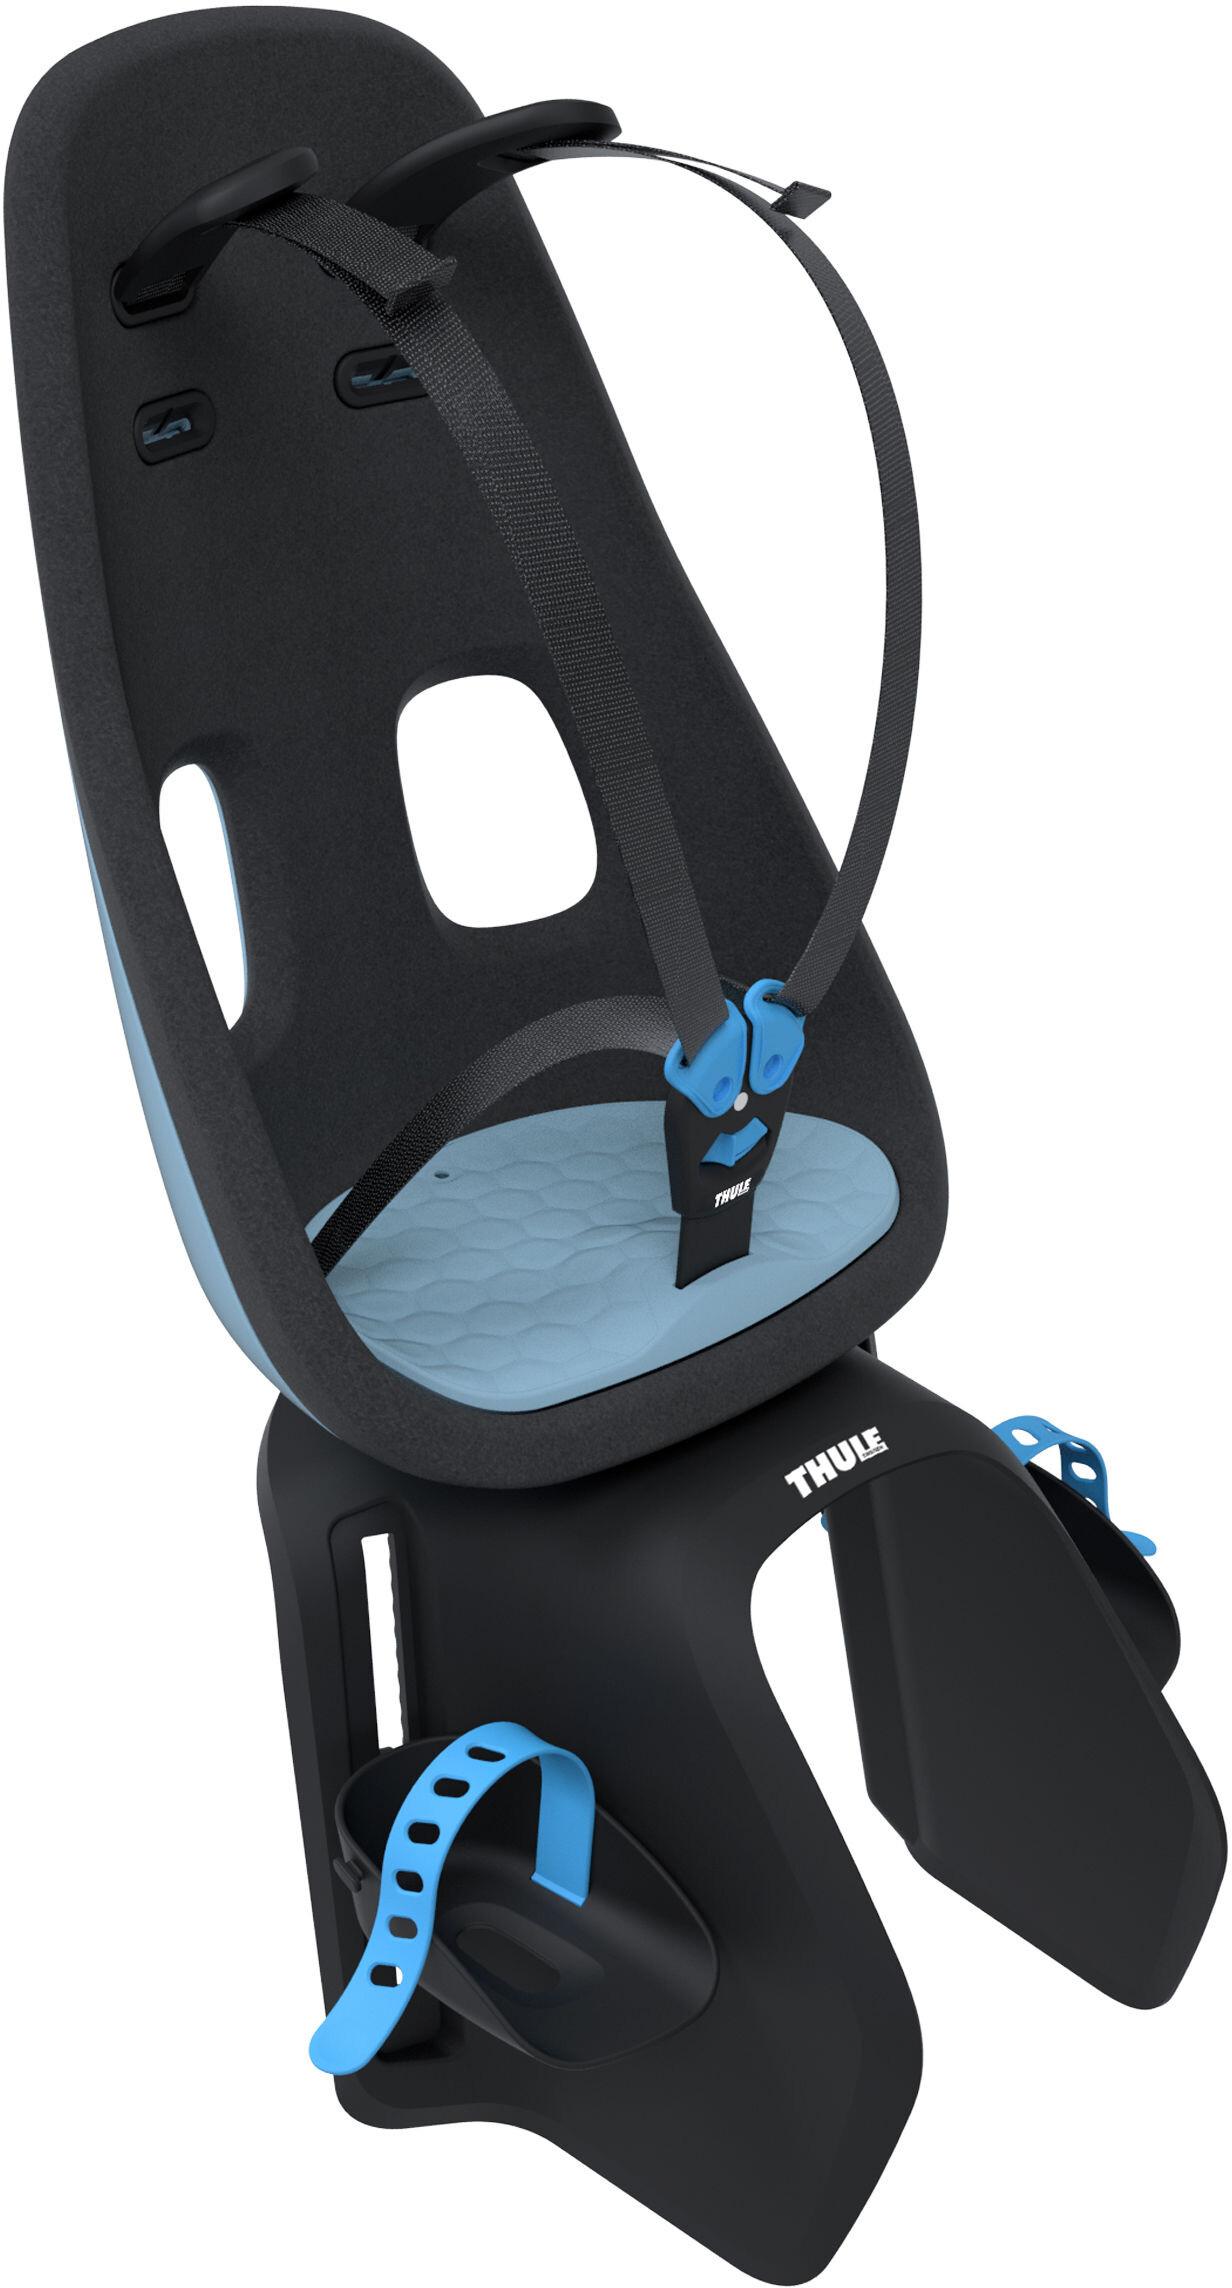 98916ec5199 Thule Yepp Nexxt Maxi Kids Bicycle Seat Universal mount blue at ...